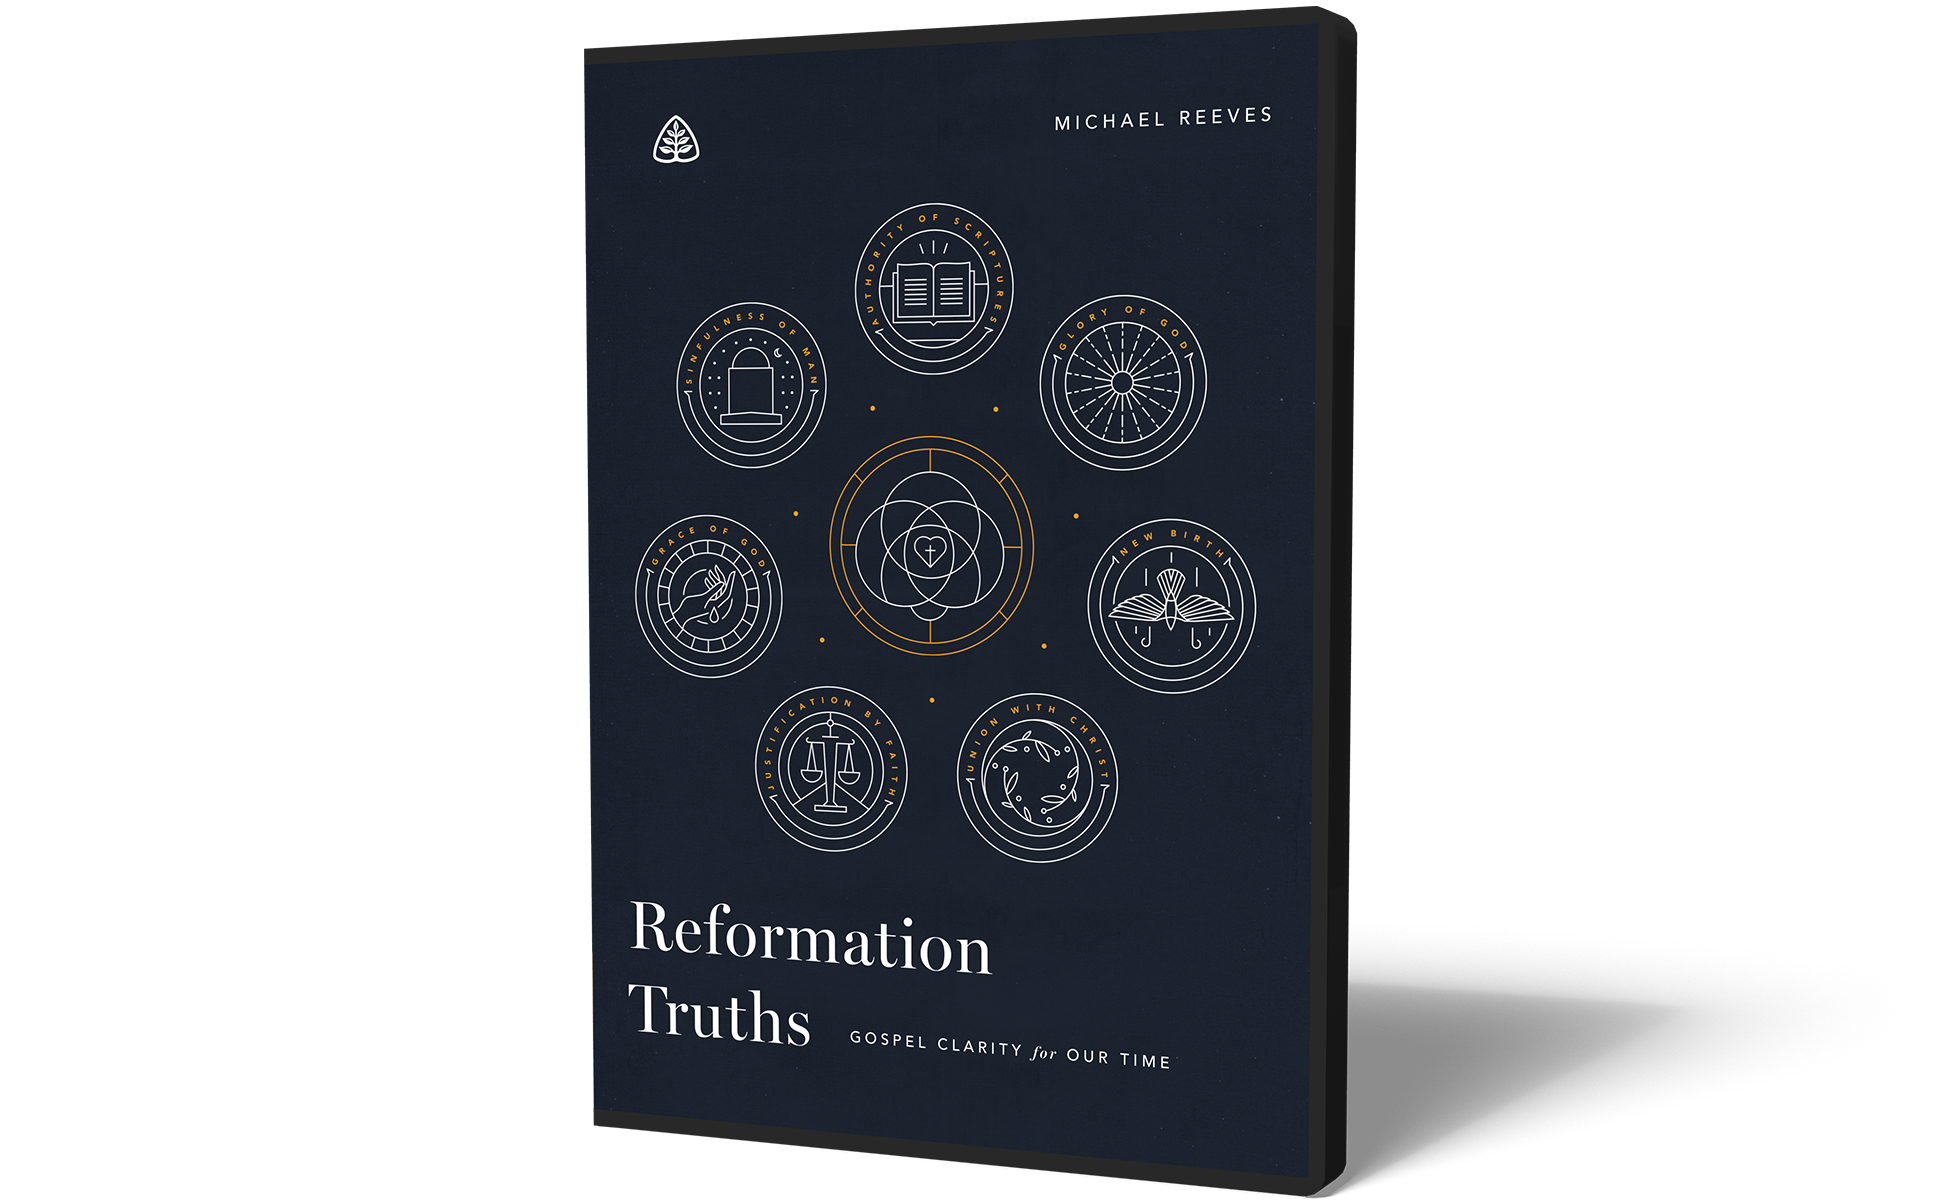 Reformation Truths